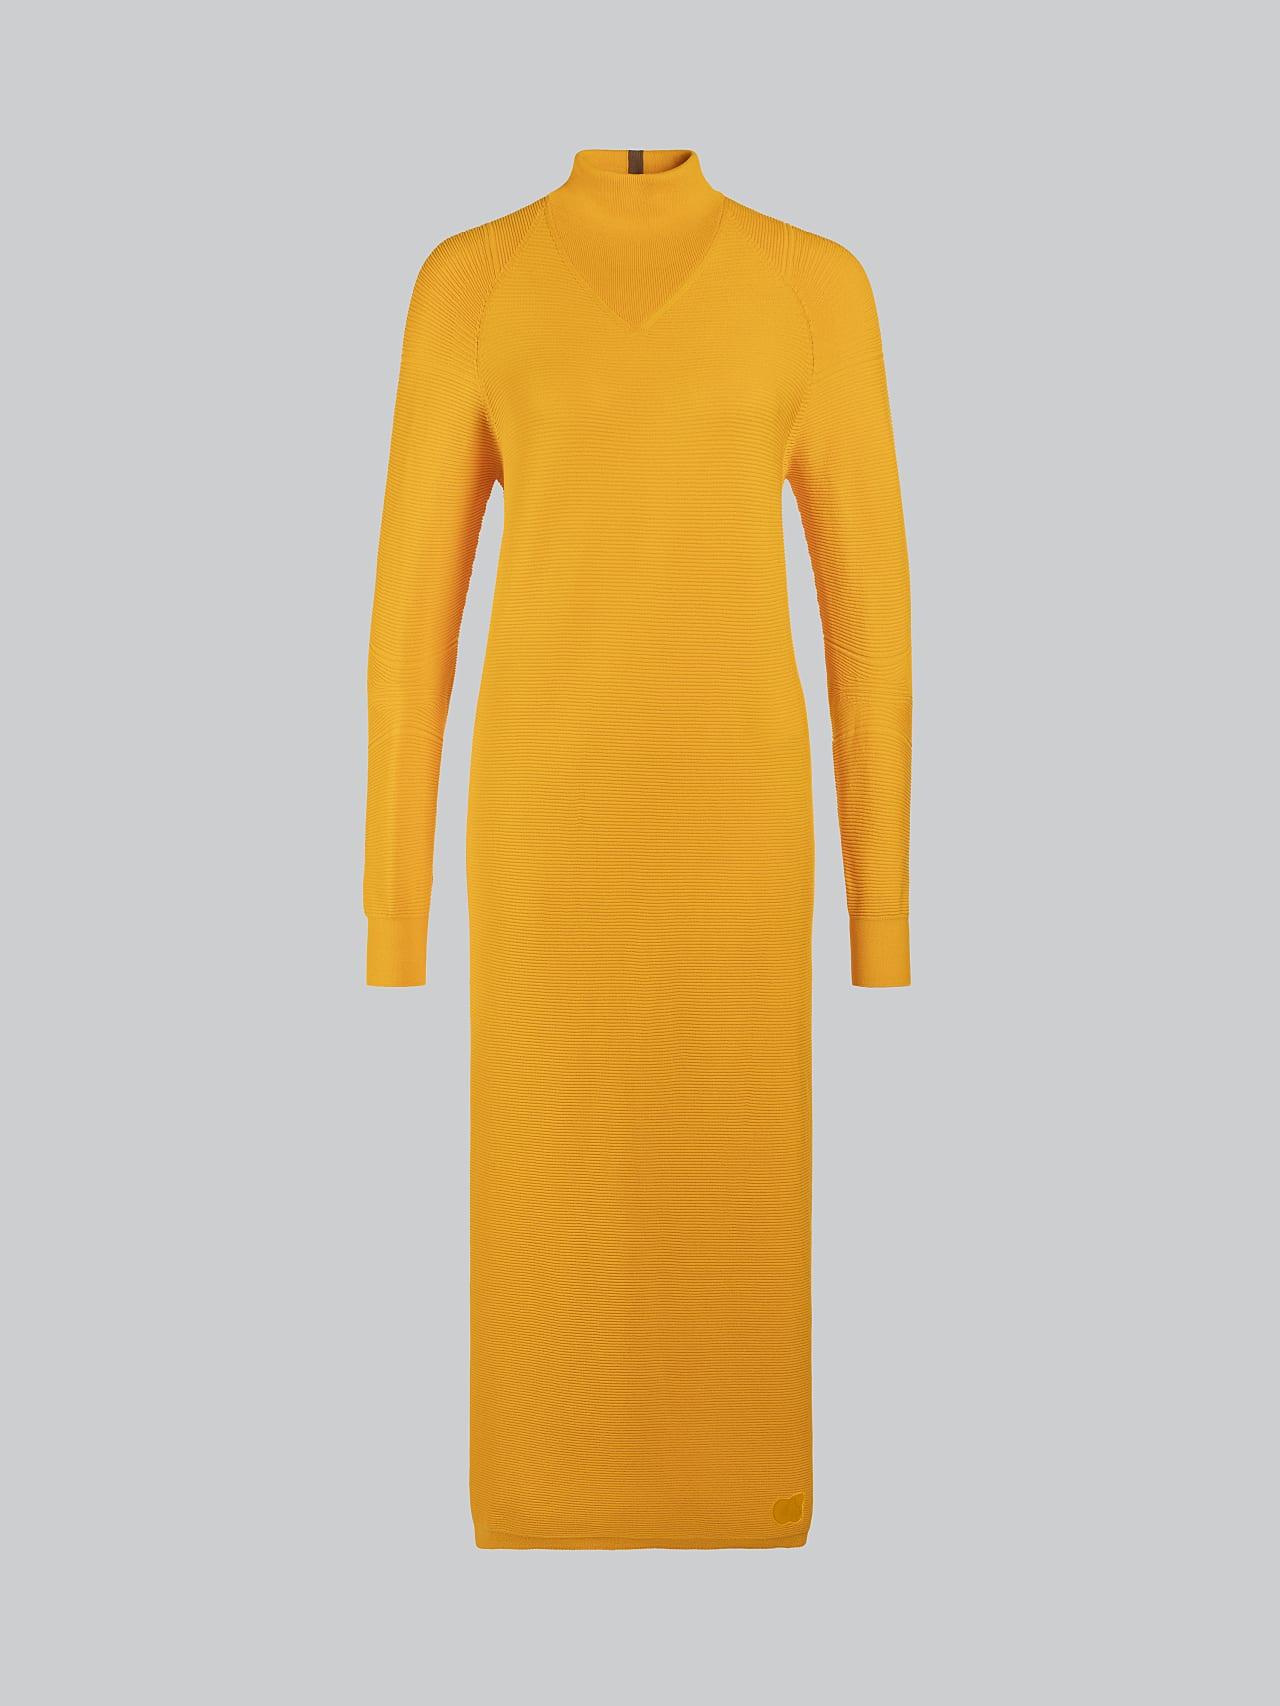 FOXEE V1.Y5.02 Seamless 3D Knit Mock-Neck Dress yellow Back Alpha Tauri